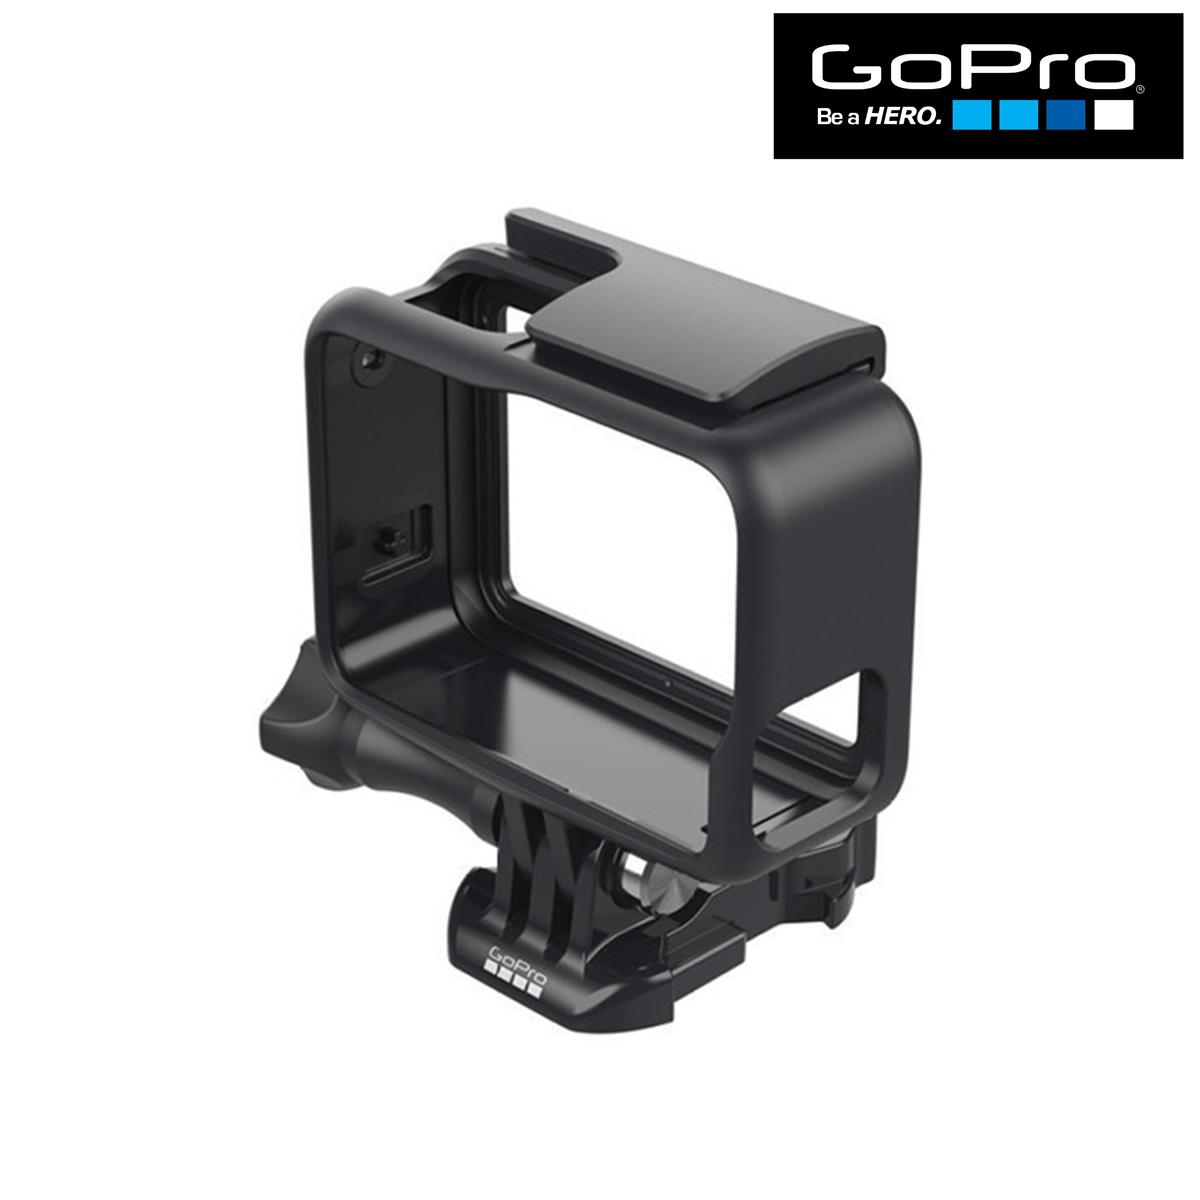 GoPro The Frame Hero5